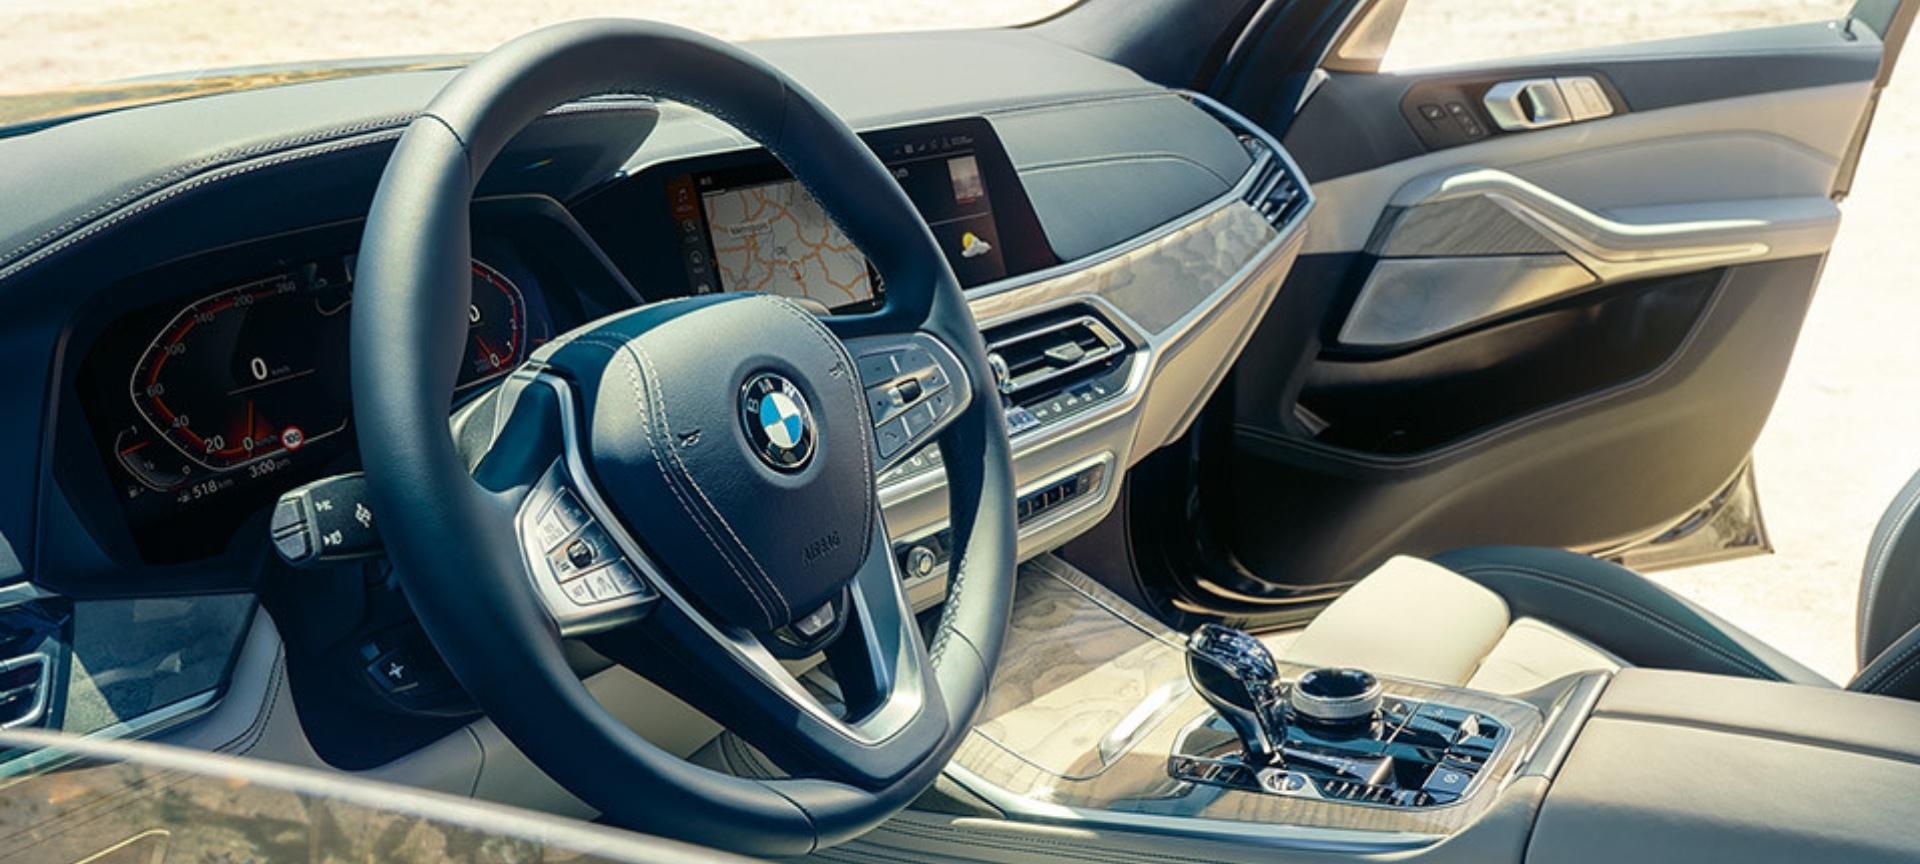 BMW X7 Interior 2